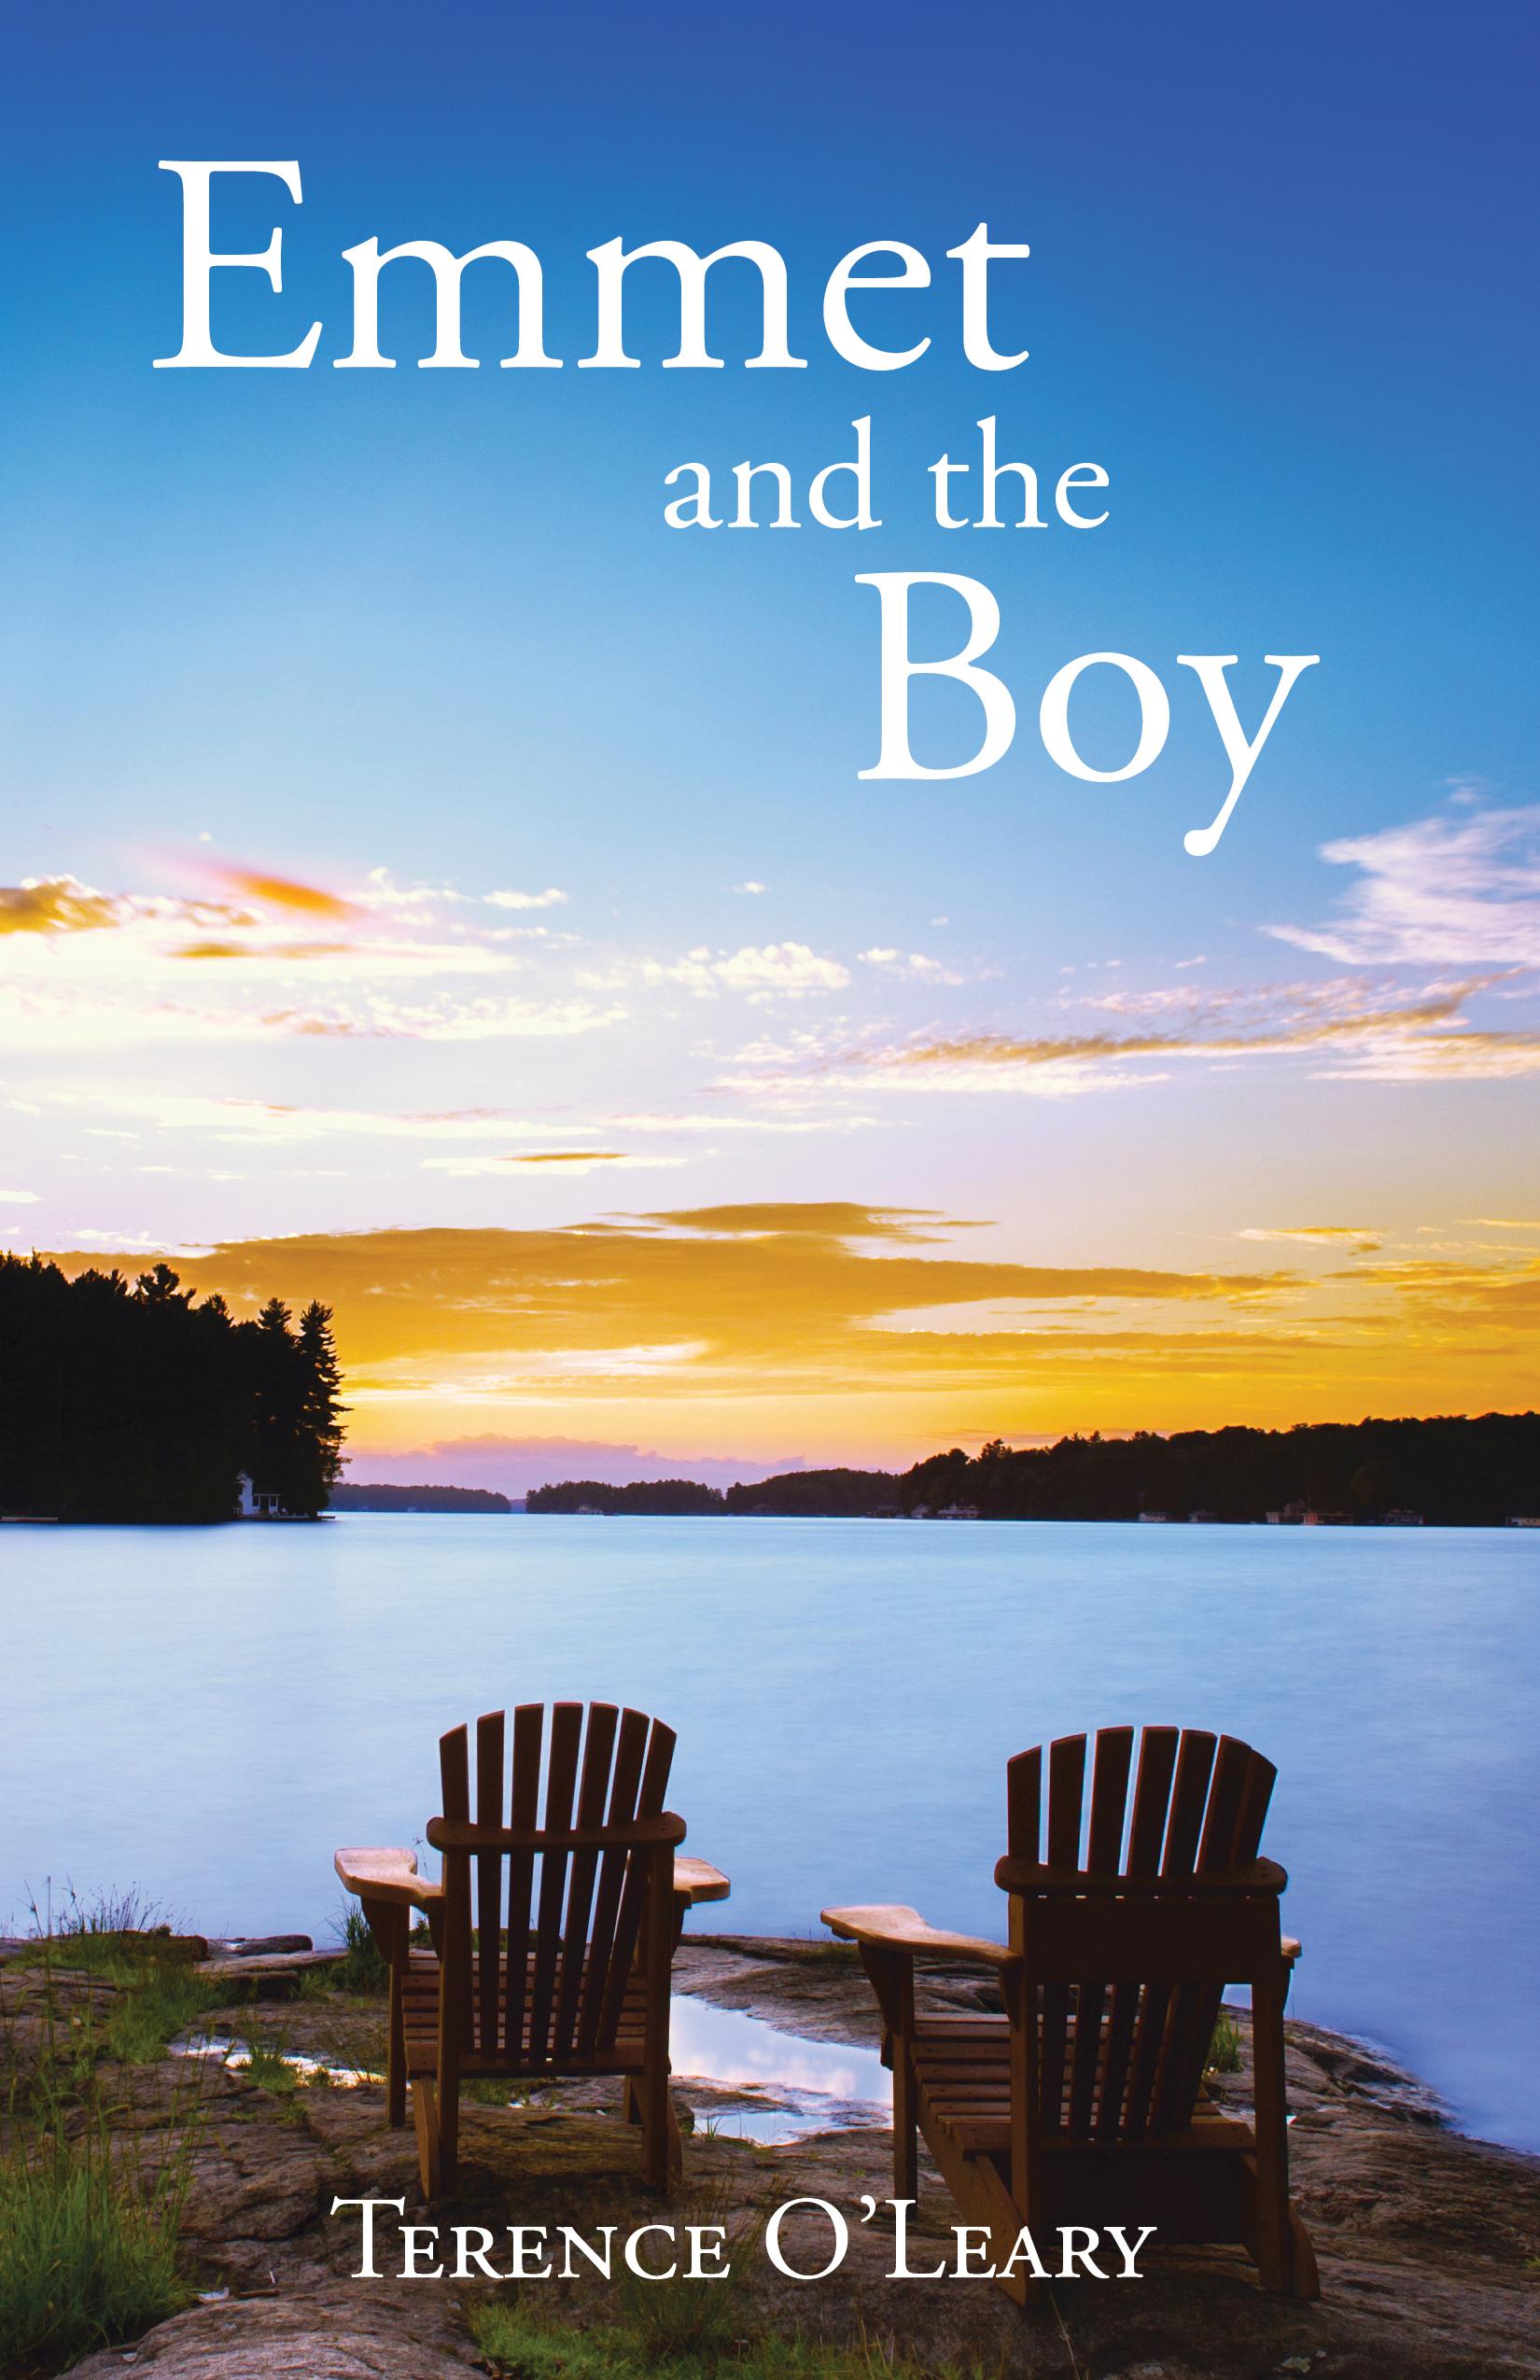 Emmet and the Boy.jpg